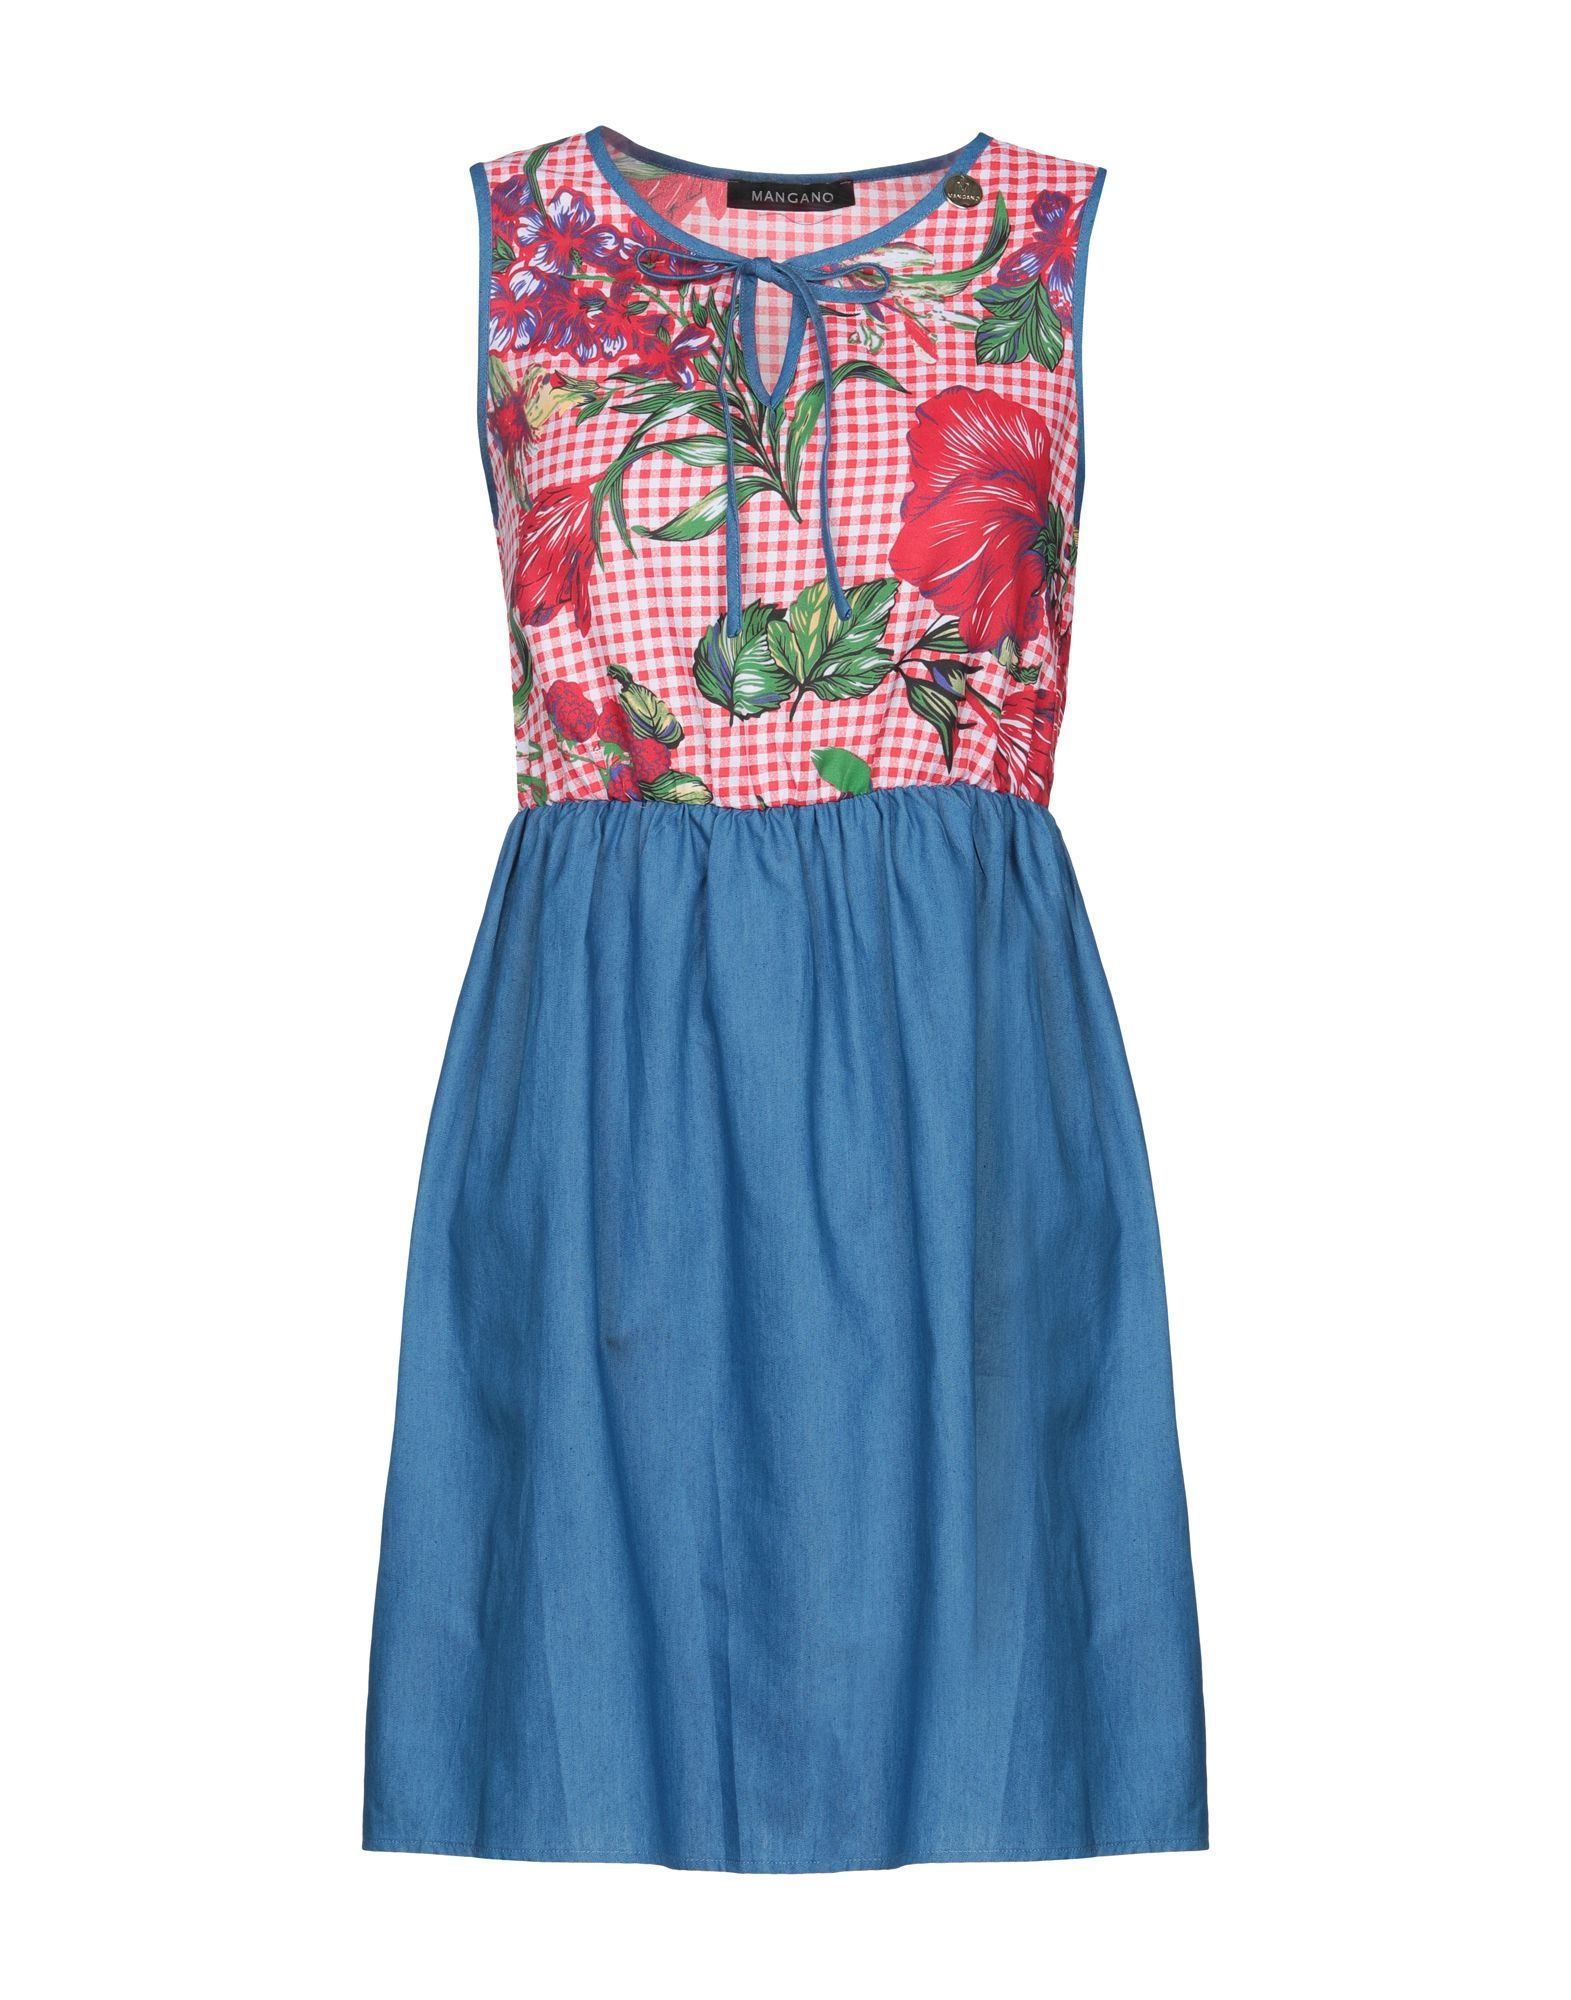 DRESSES Woman Mangano Red Cotton